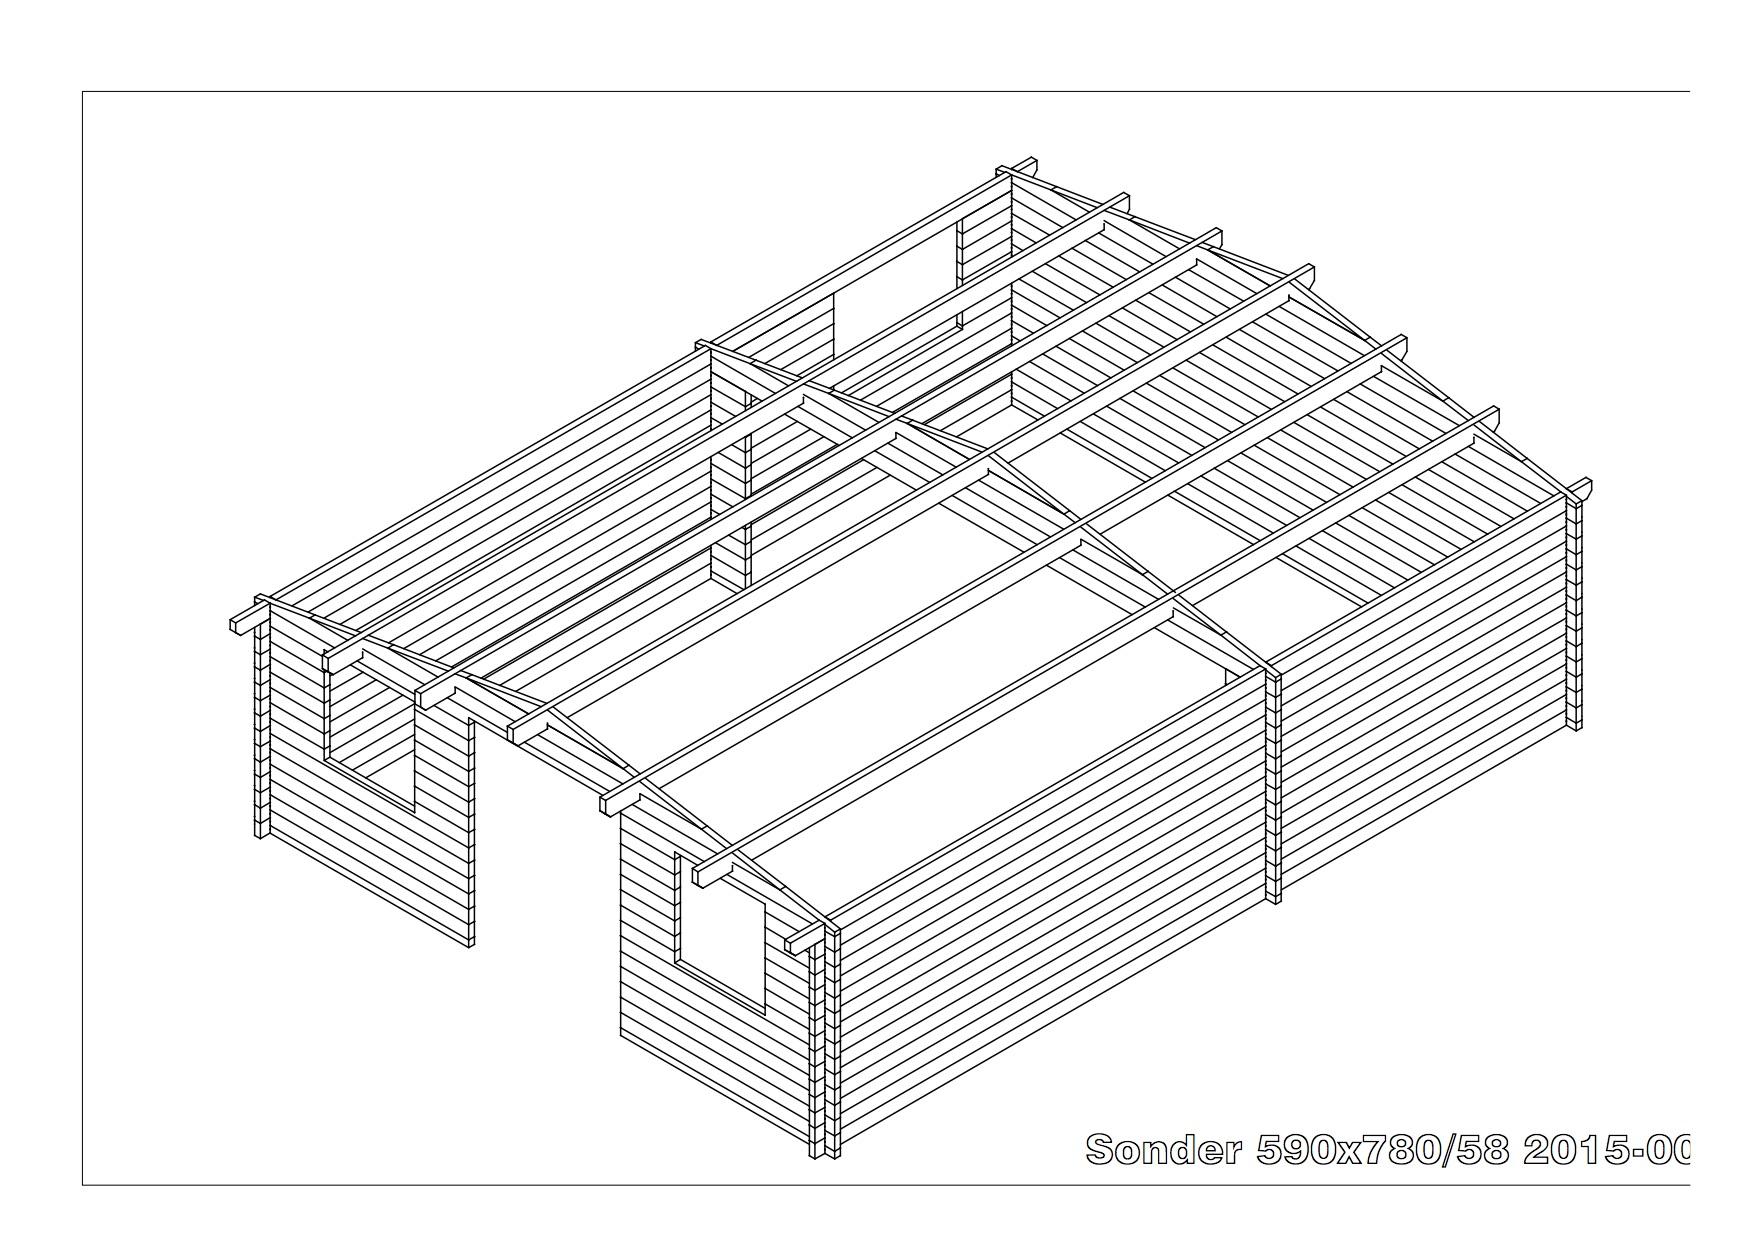 bespoke log cabin example plans